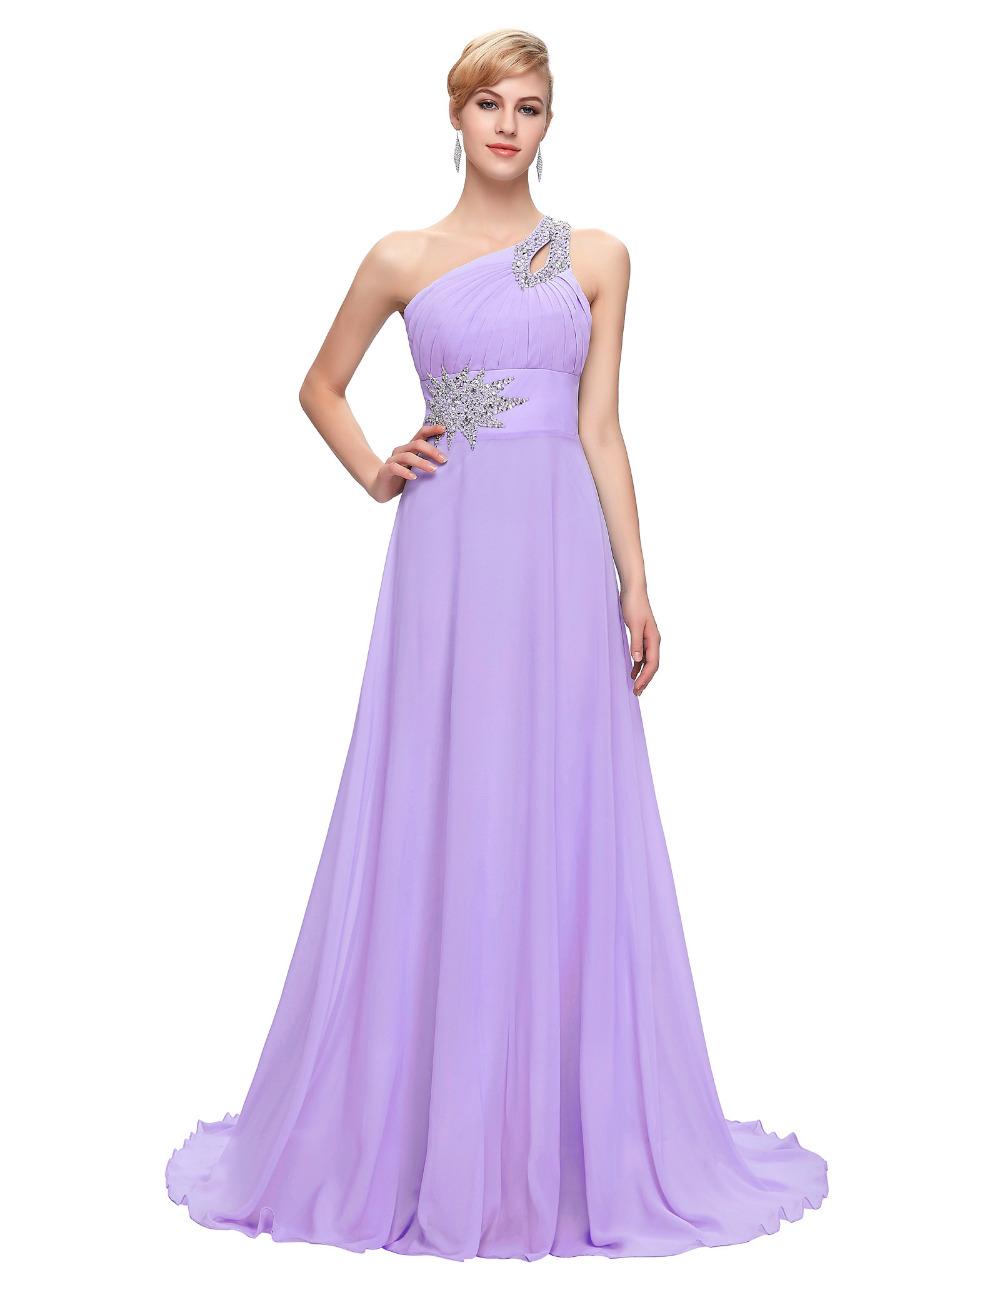 Online Get Cheap Lilac Dresses -Aliexpress.com | Alibaba Group